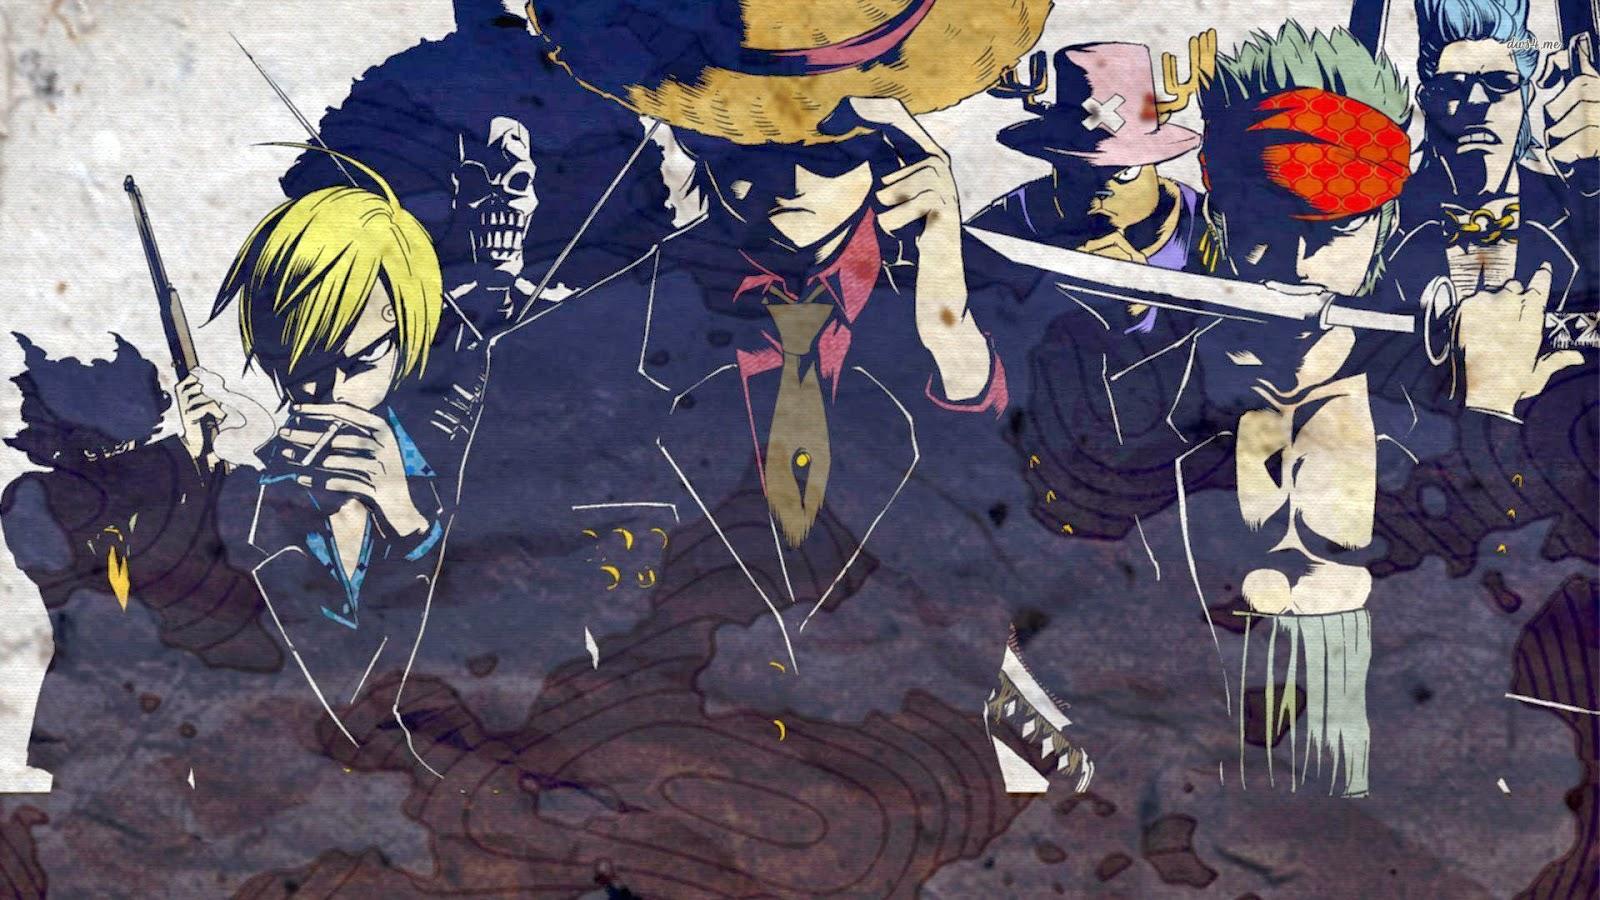 Hukum Dan Gambar Abstrak Soundtrack One Piece